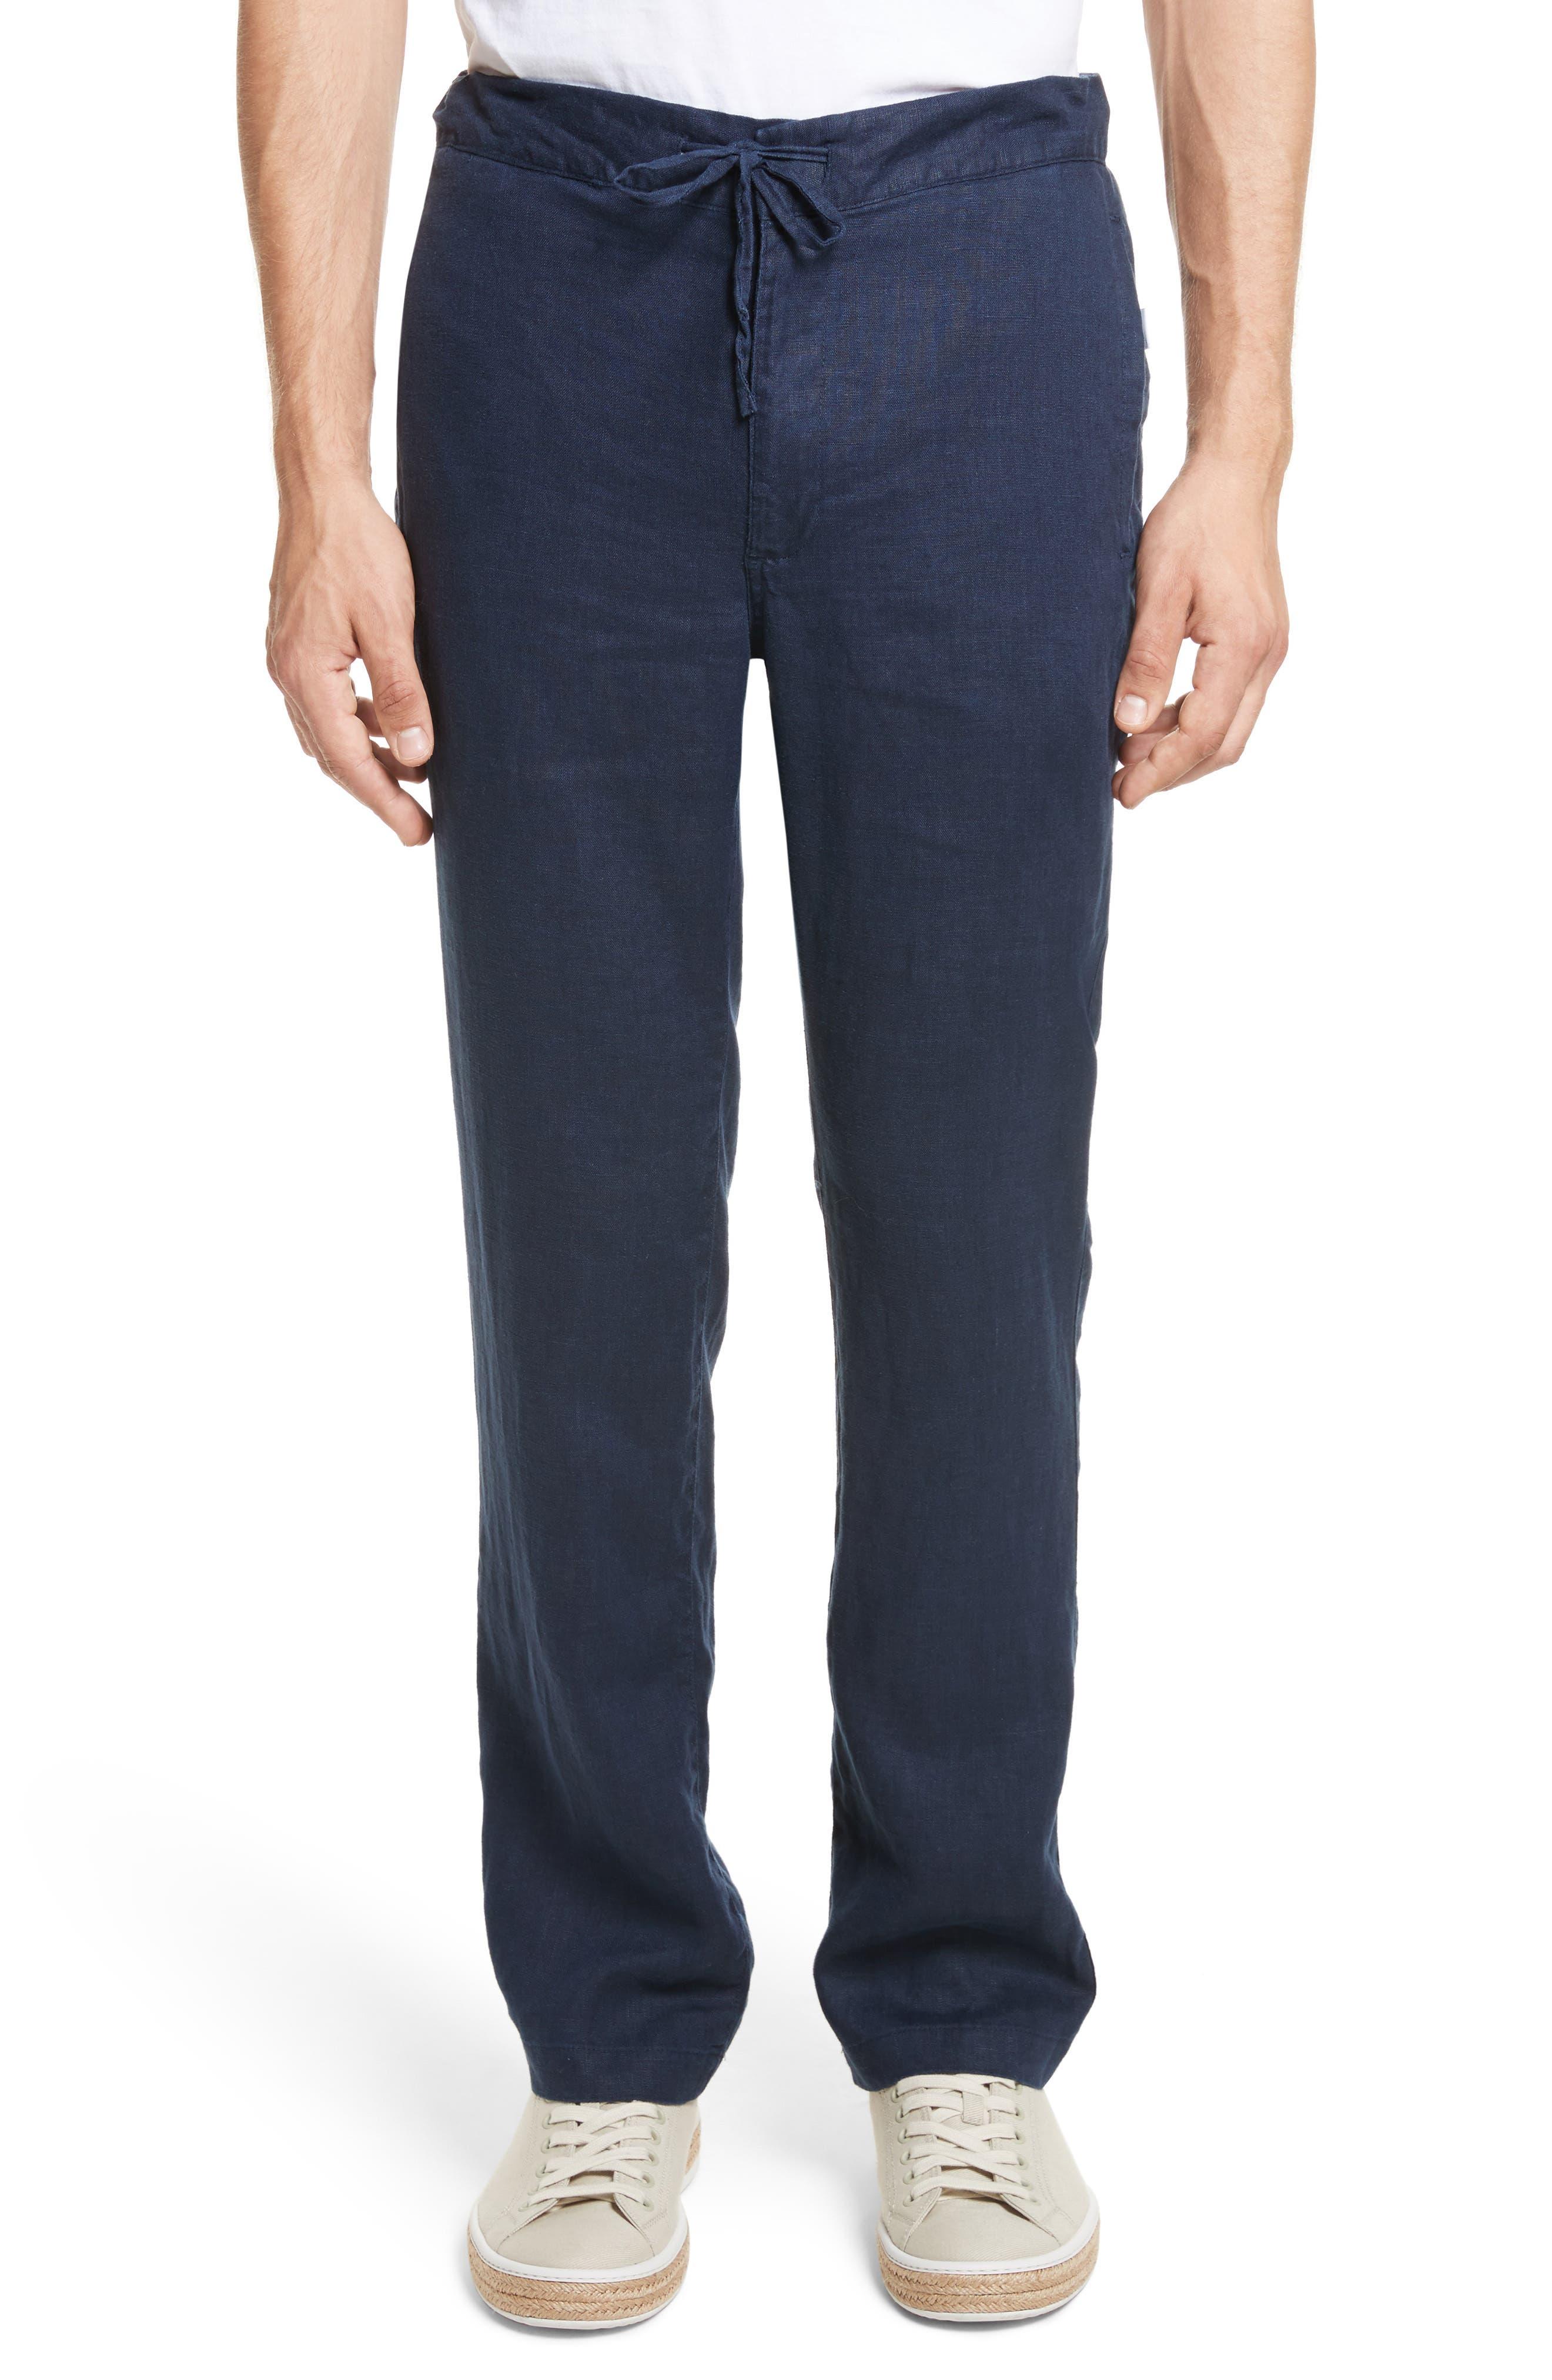 ONIA Collin Linen Pants